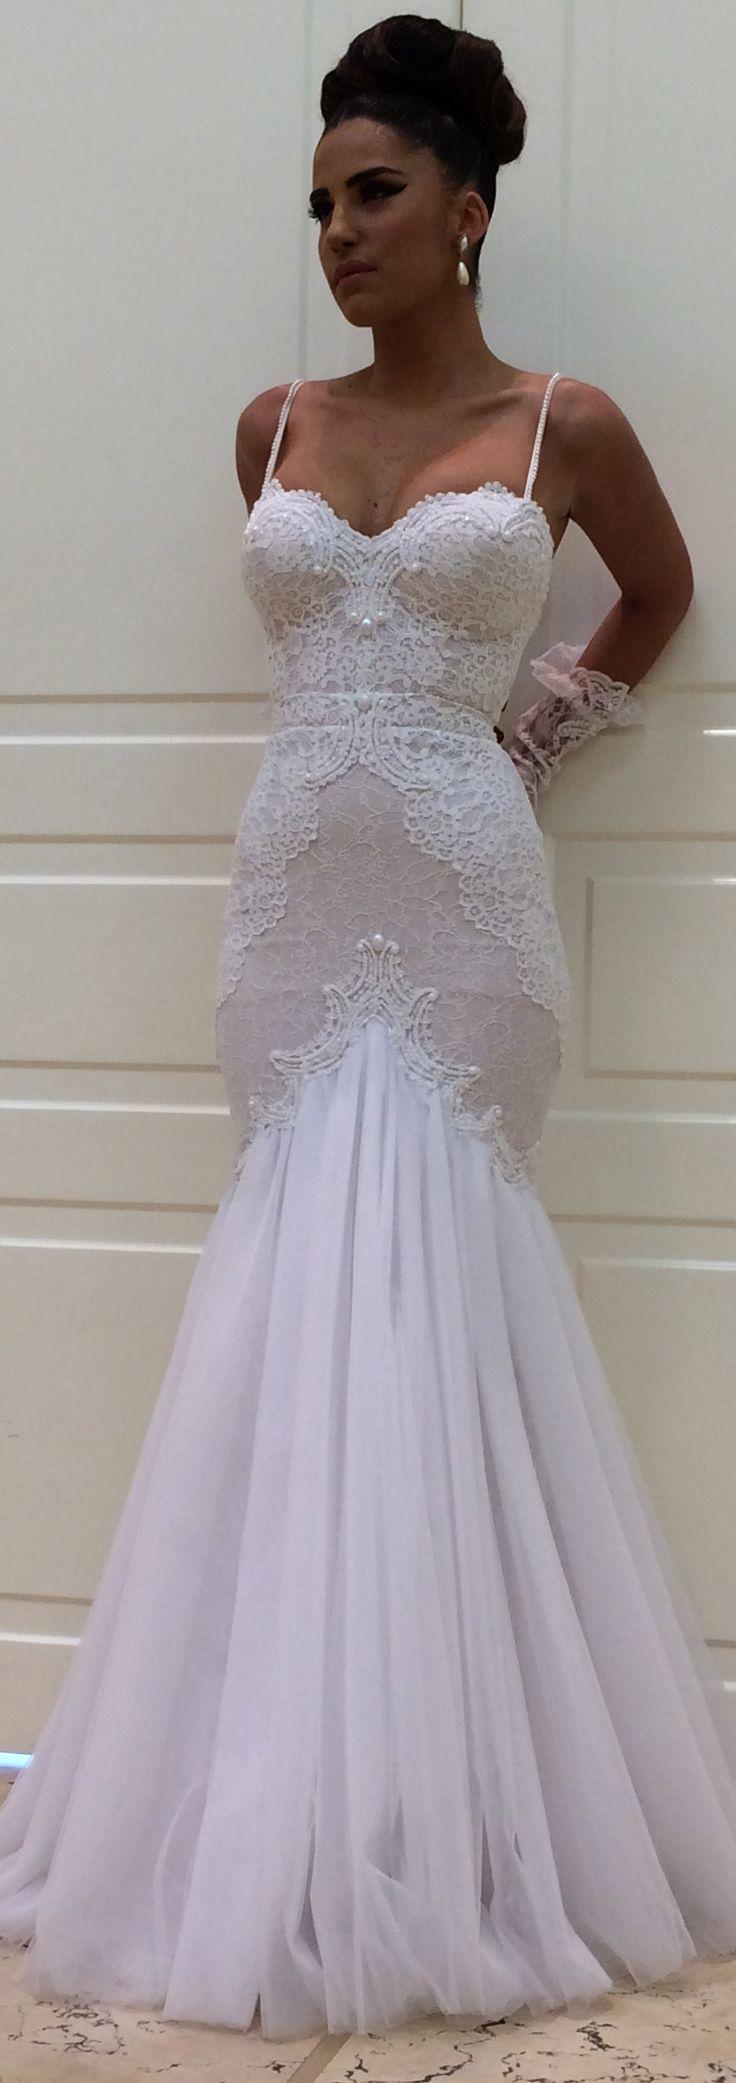 Stunning #BERTA bride in a BERTA masterpiece <3 Model 13-164